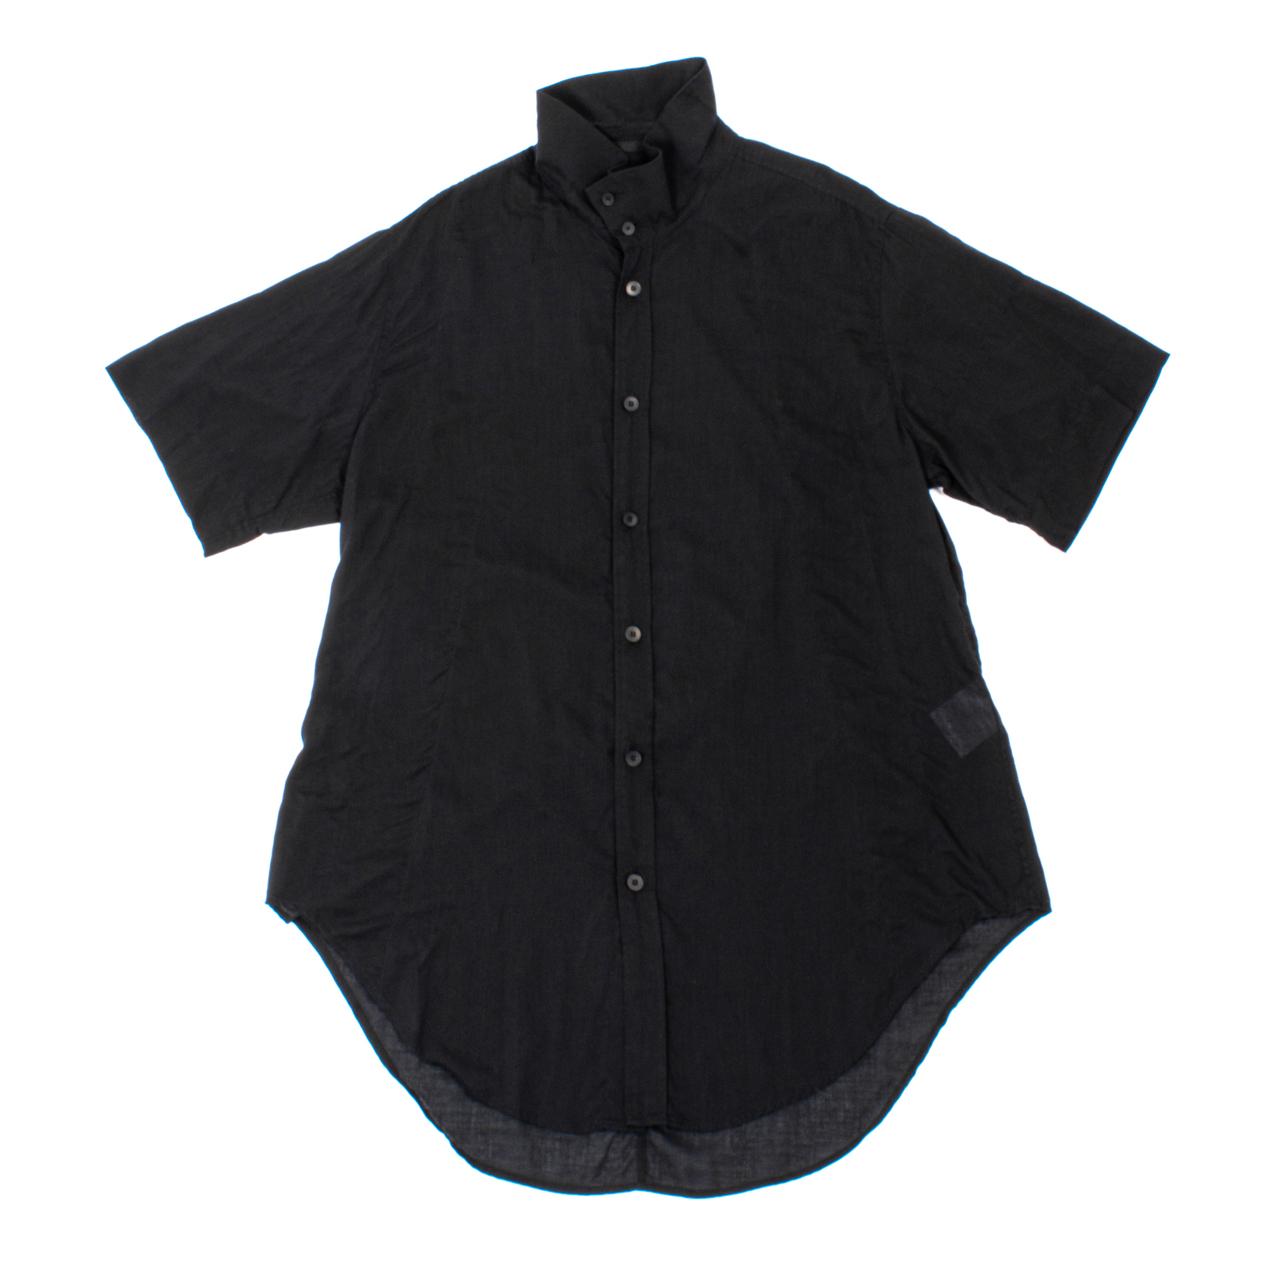 707SHM4-BLACK / スタンドカラーシャツ